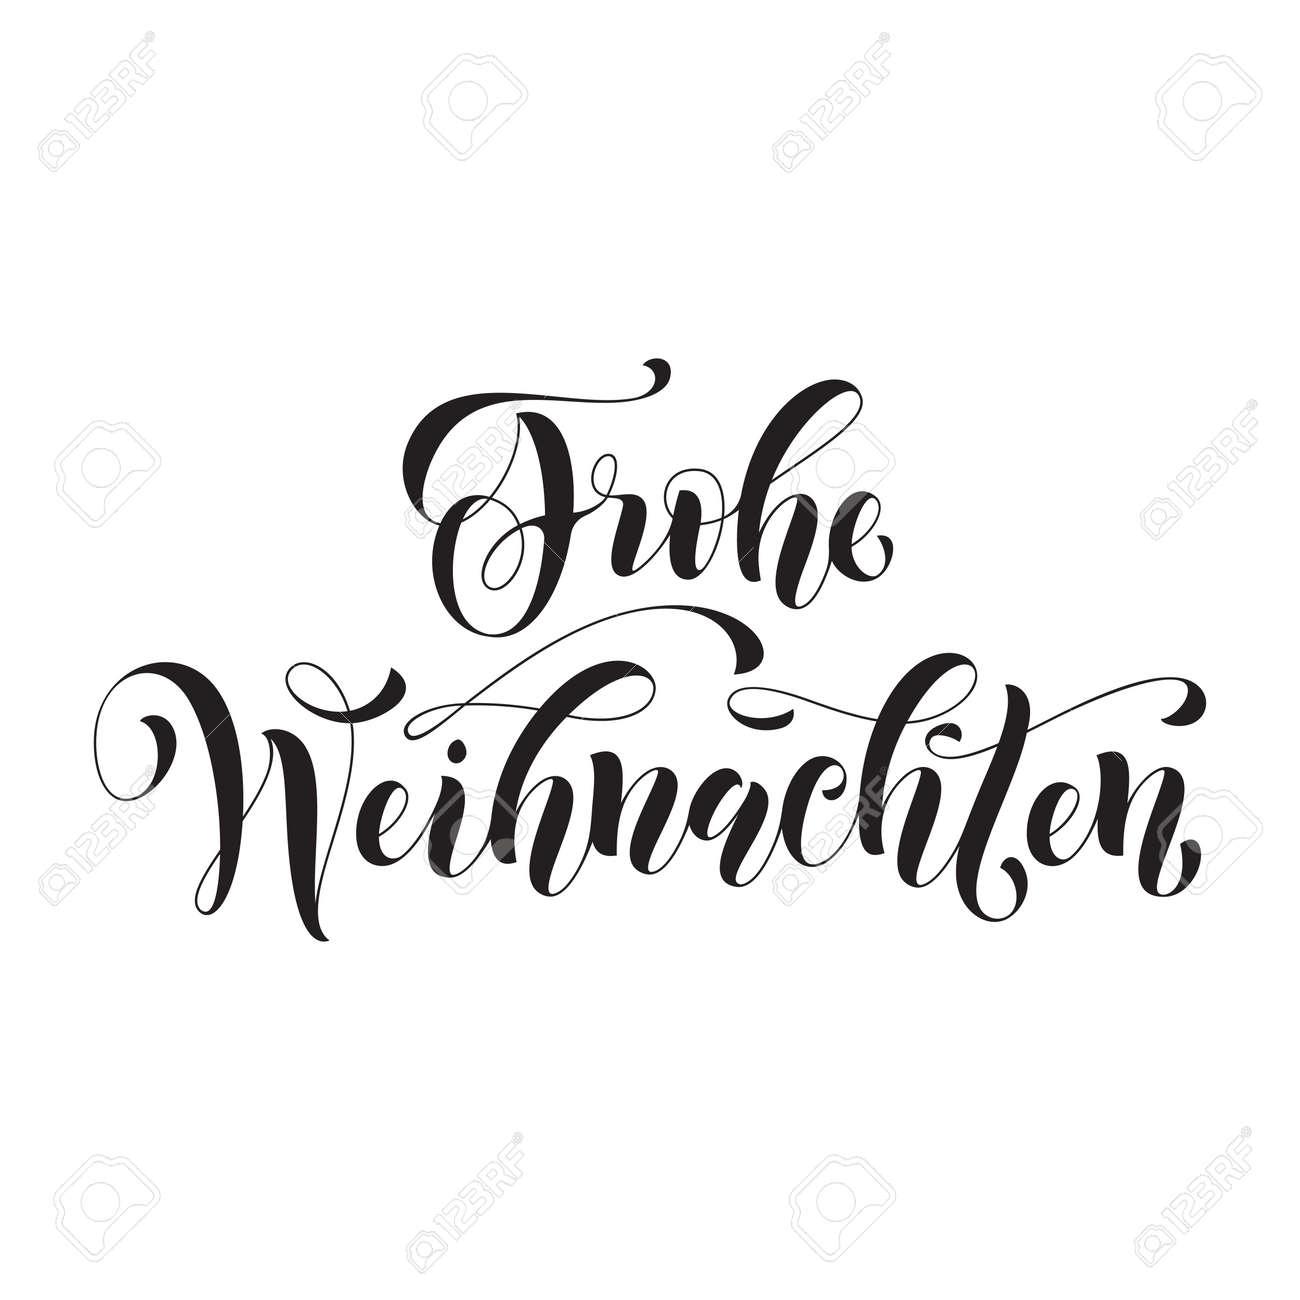 Frohe Weihnachten Text.Frohe Weihnachten German Christmas Greeting Card Vector Hand